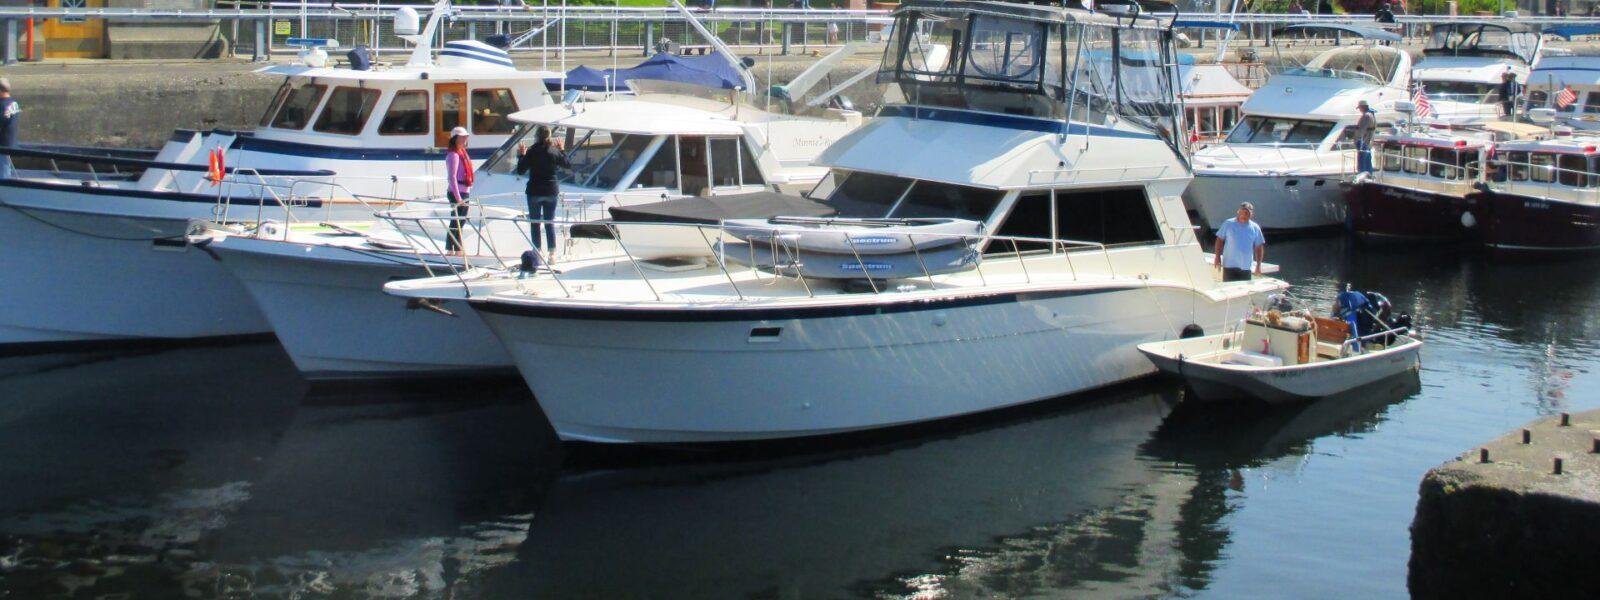 Seattle Easter Boat Parade, Sea Captains, Yacht Crew, Superyachts PNW, Cruising, PNW Boats, Seattle WA, Salty Dog Boating